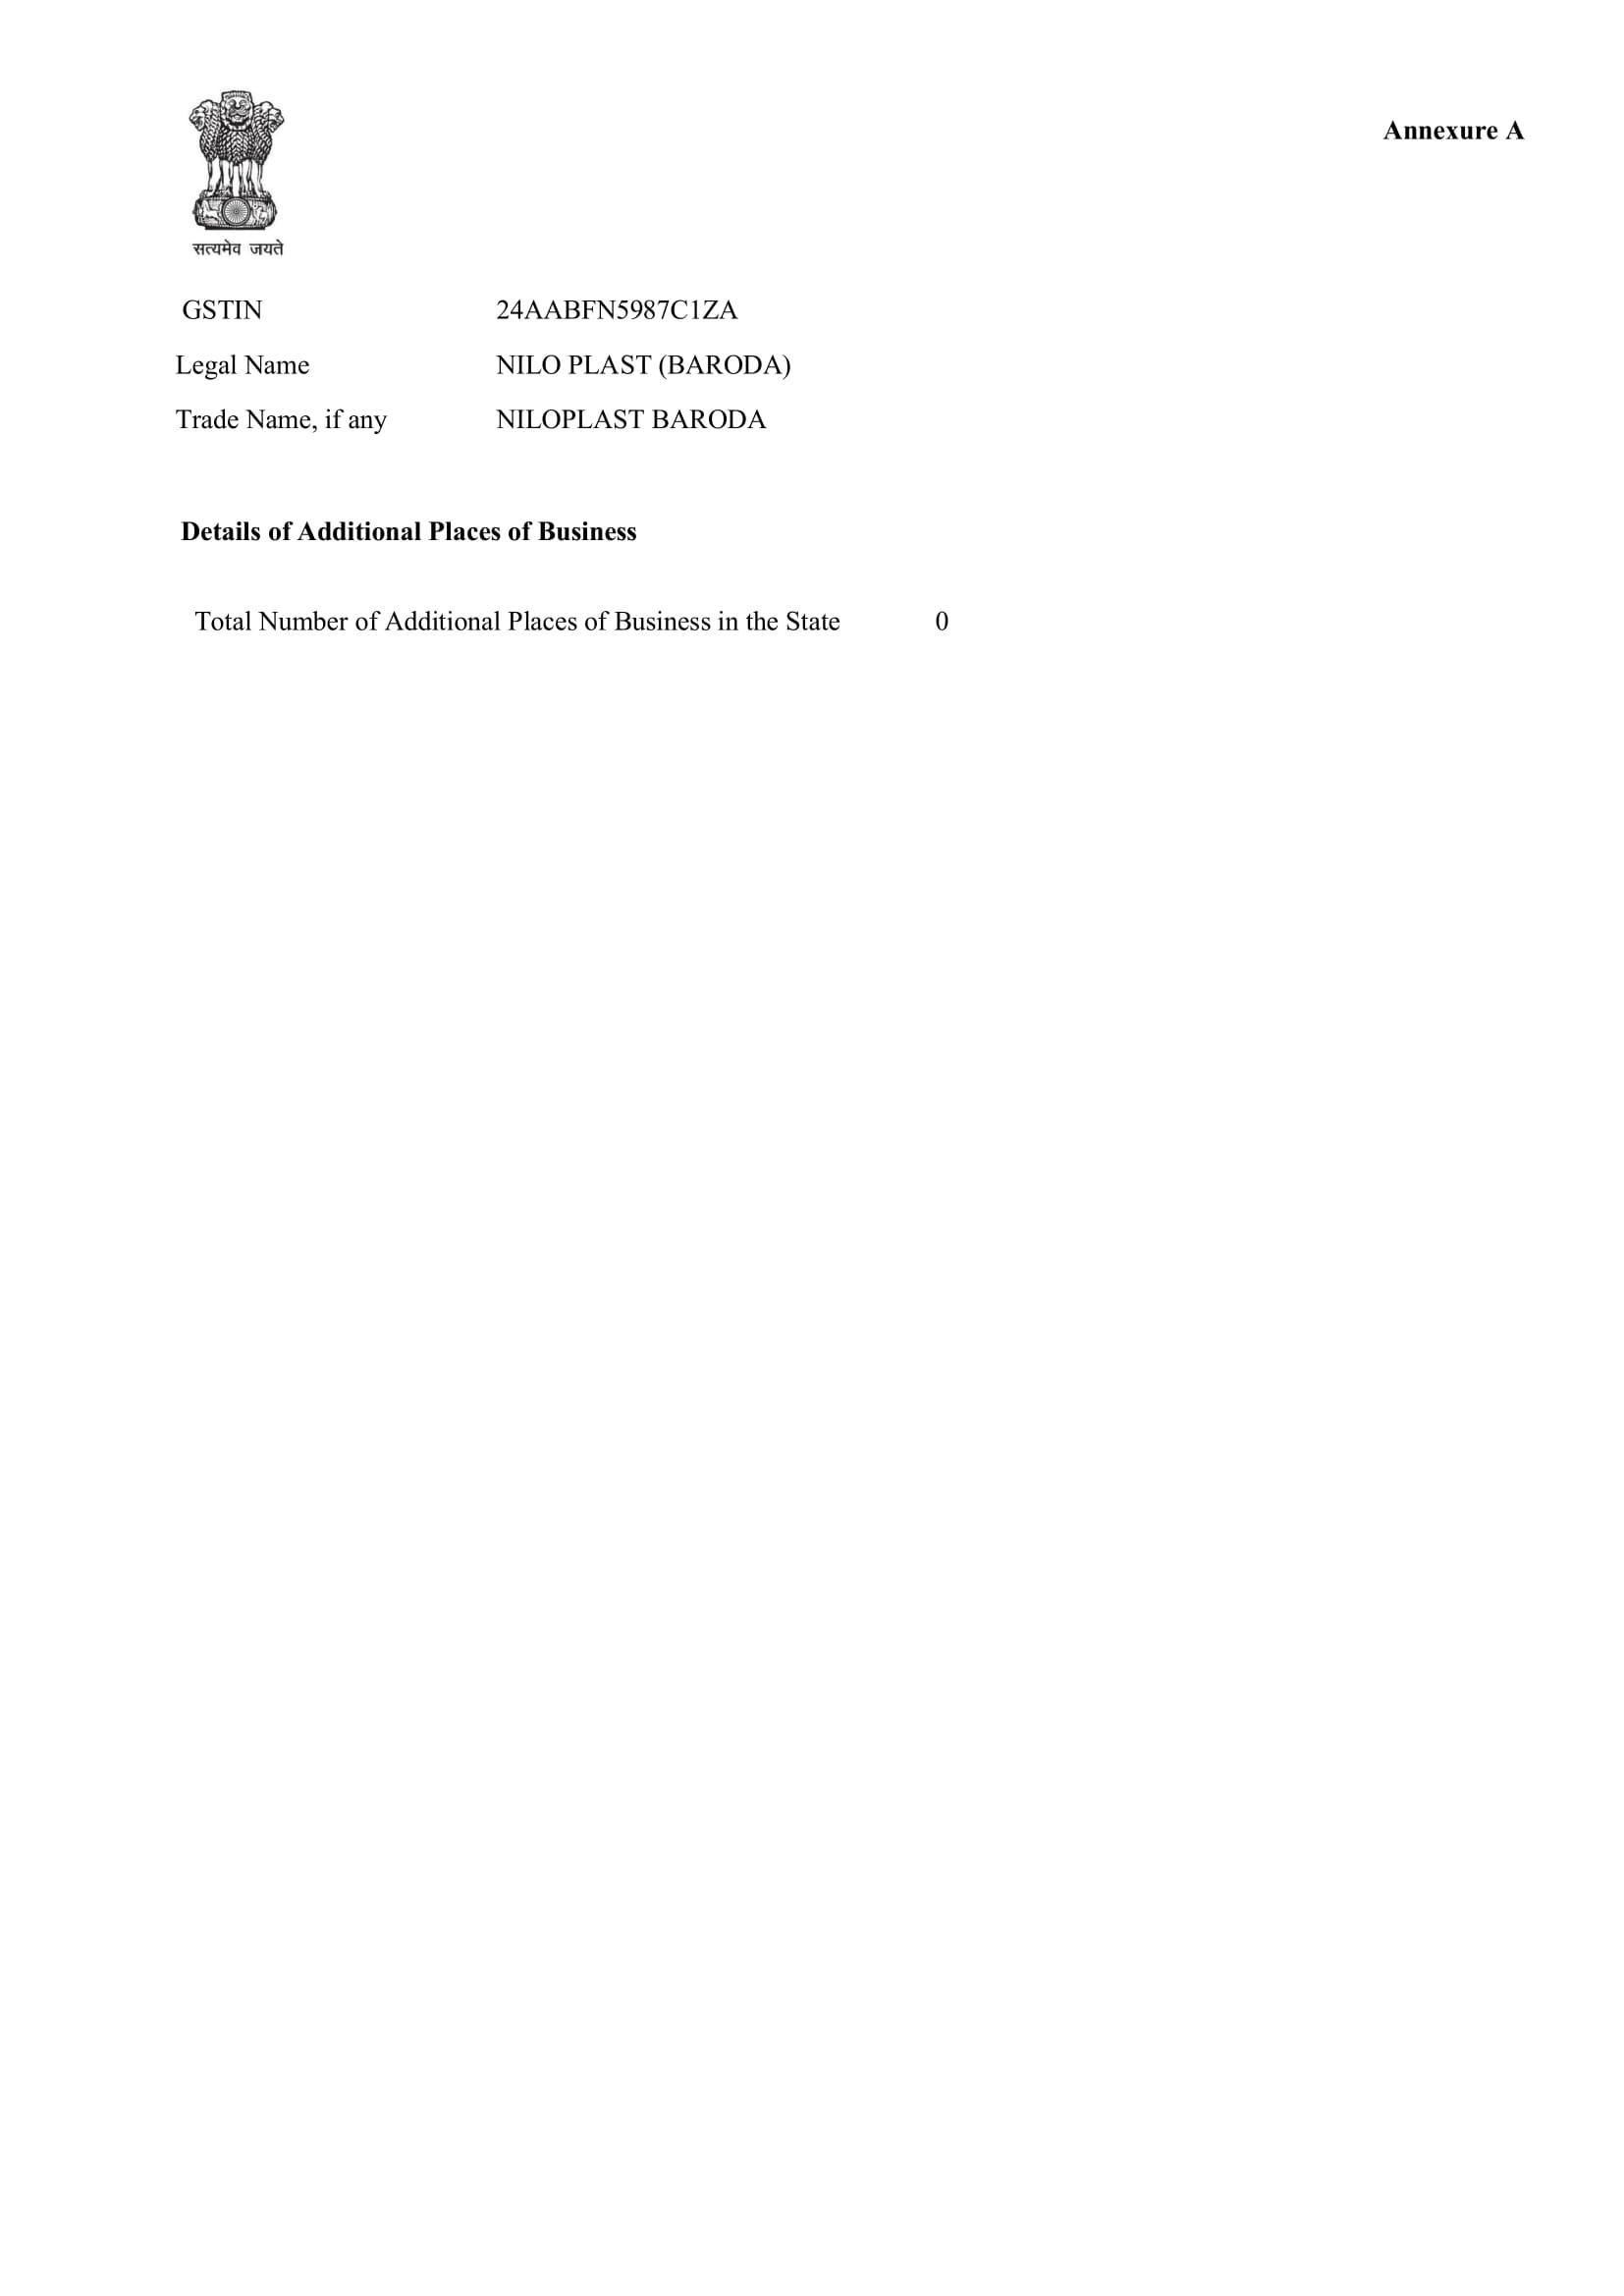 New GST Certificate 02